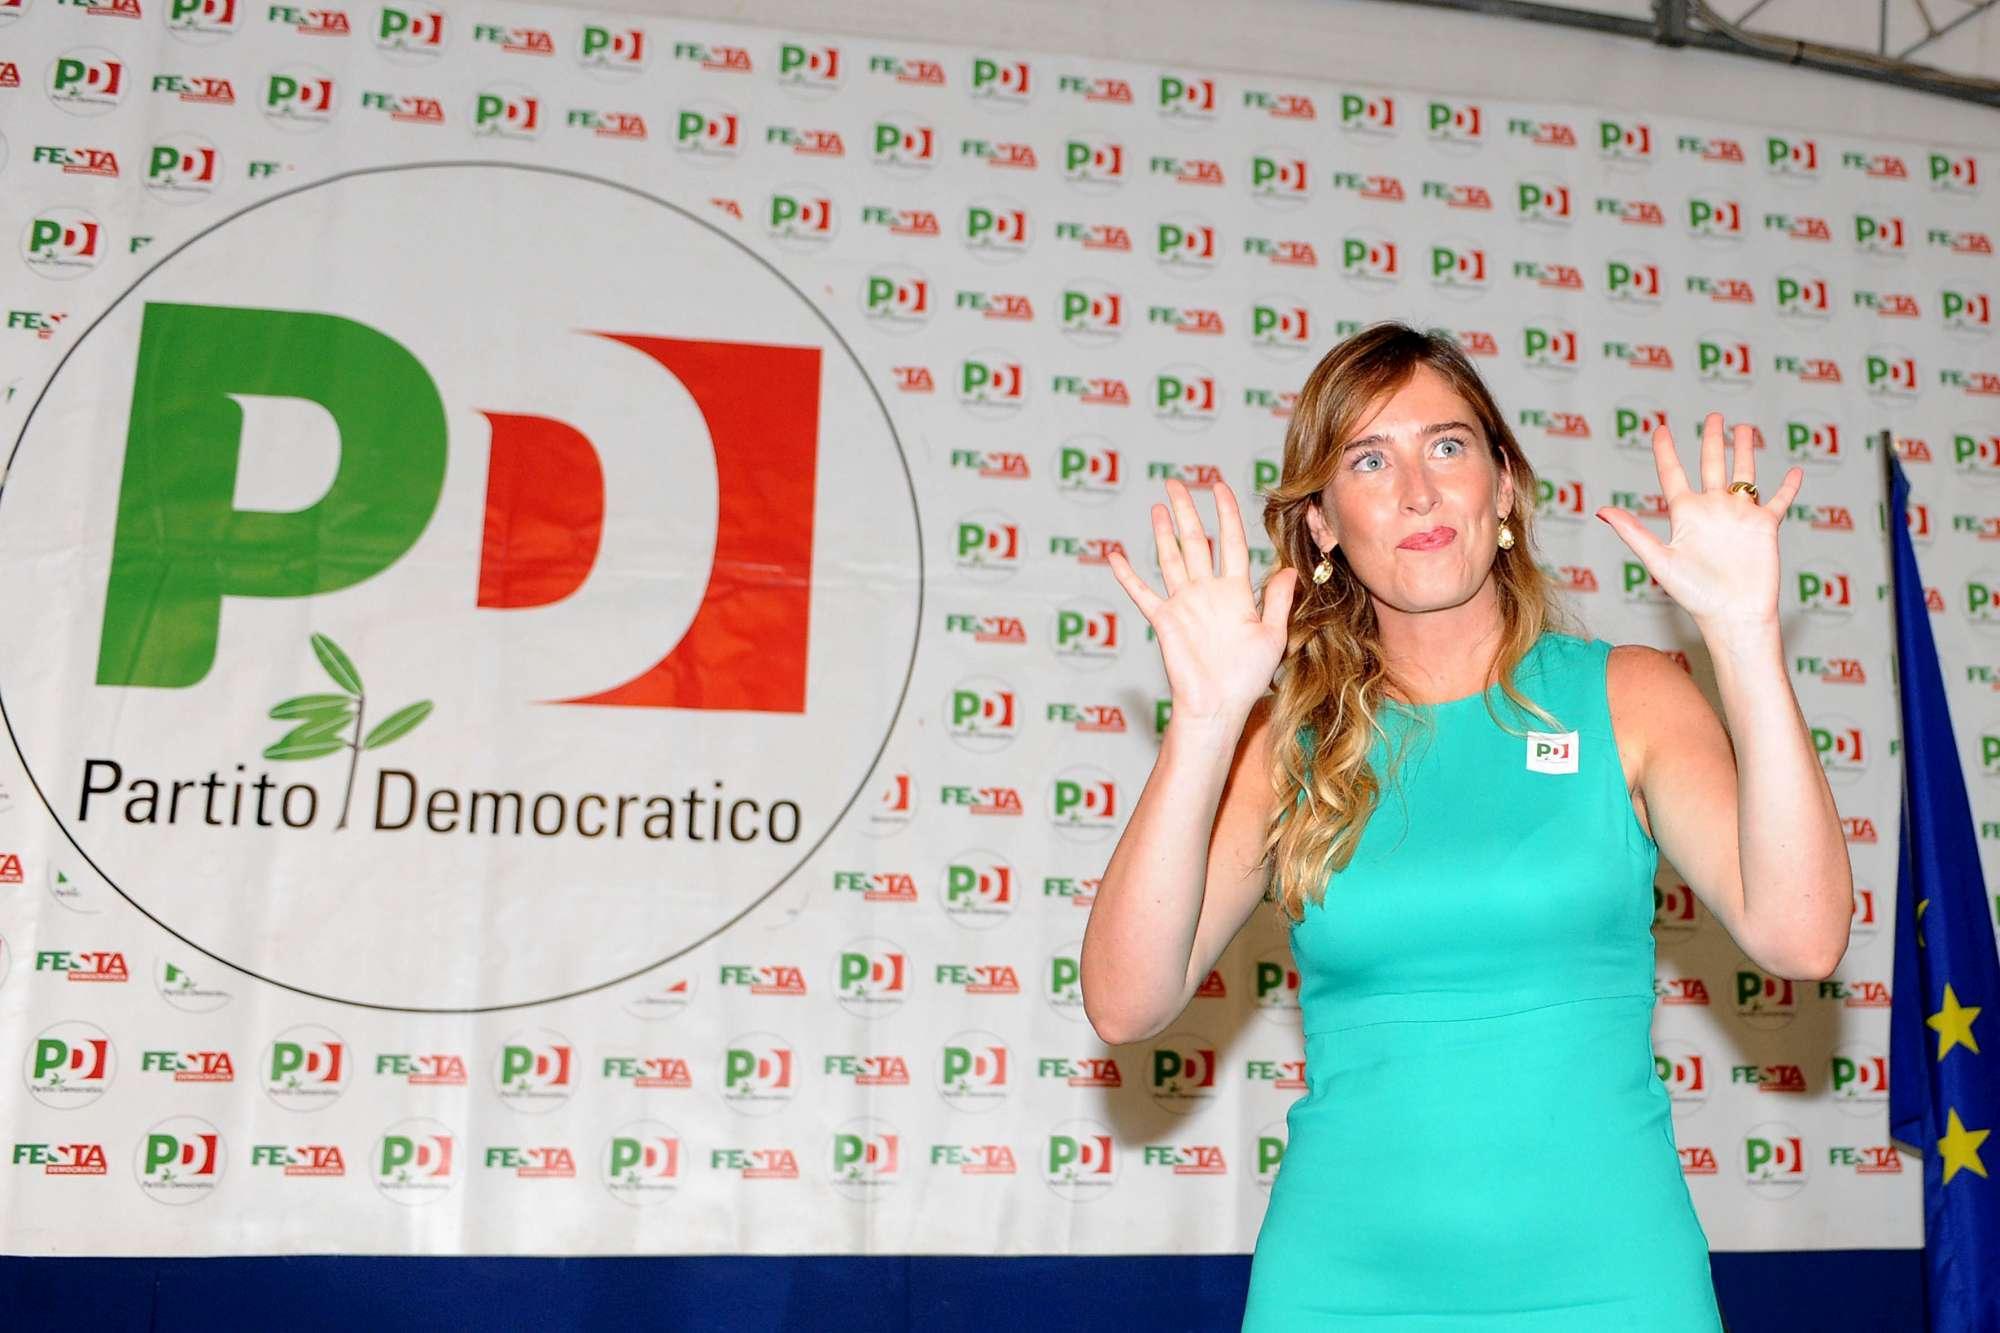 Italia Viva, ecco i 26 deputati che hanno seguito Renzi